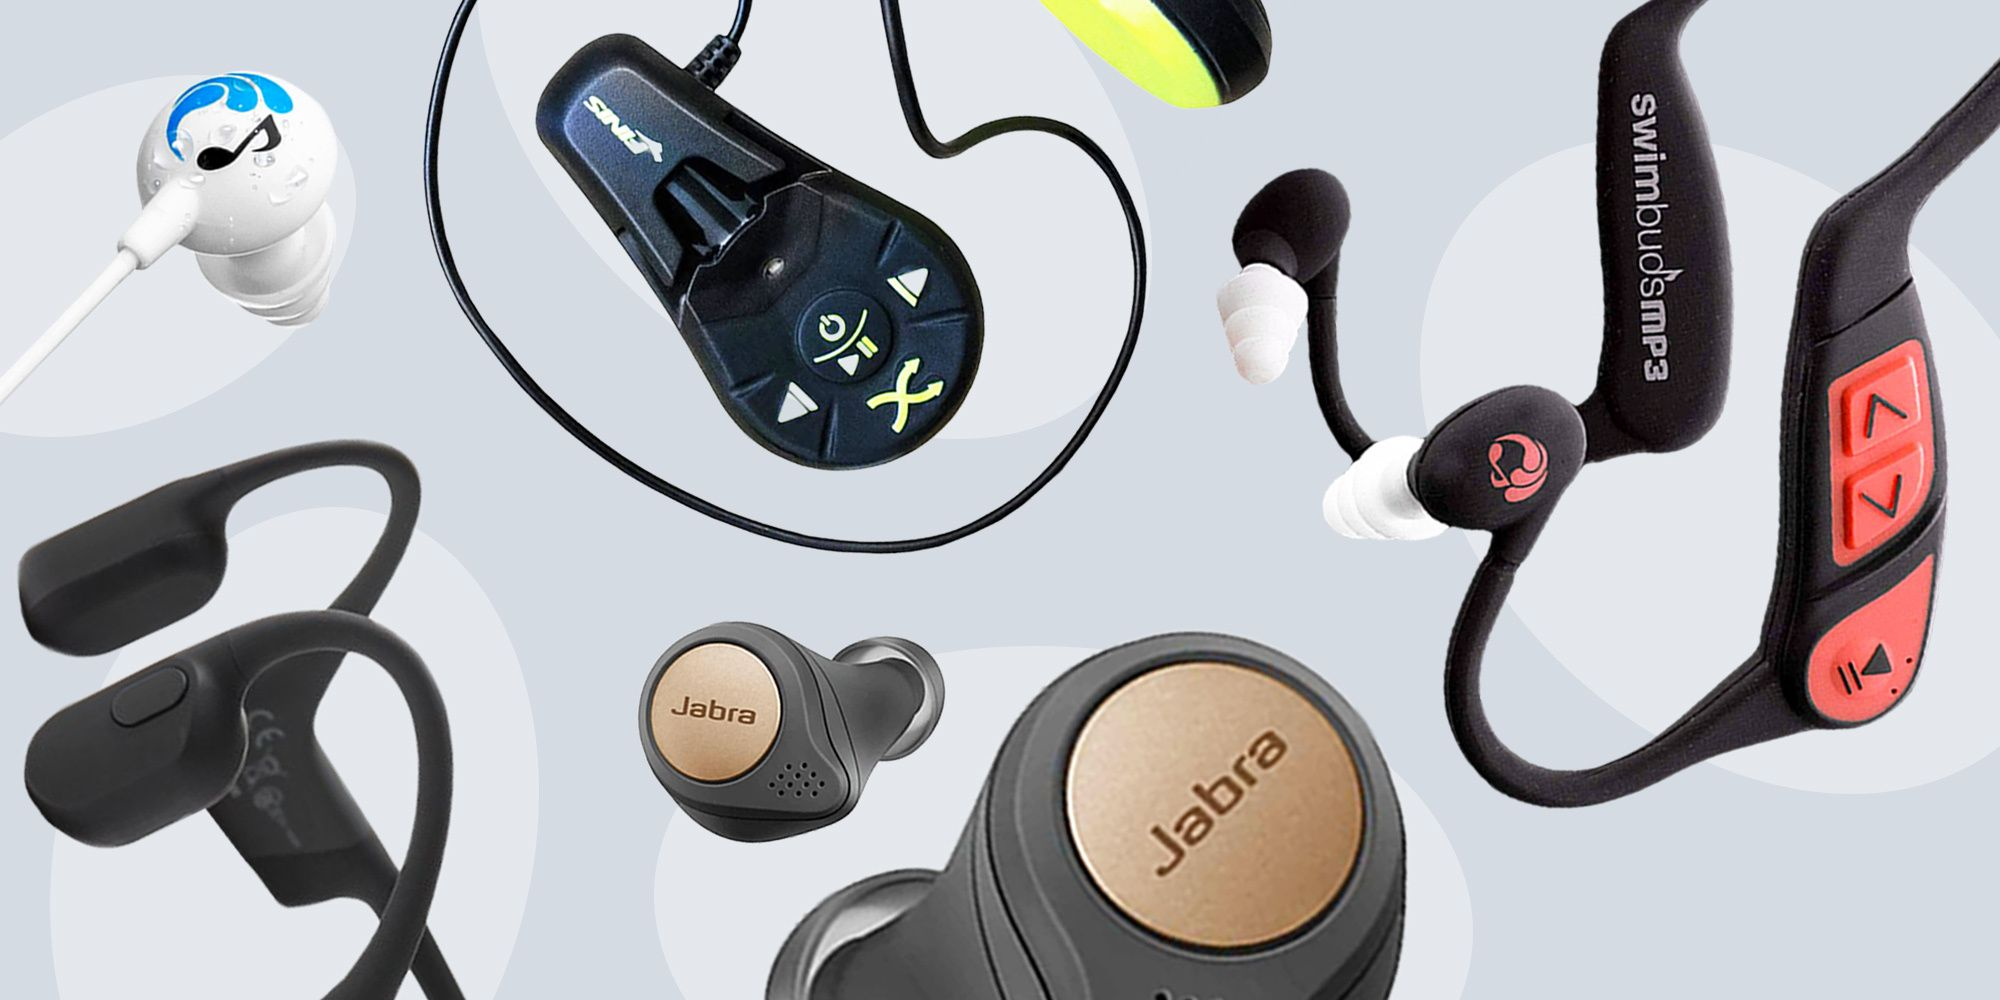 10 Best Waterproof Headphones Top Wireless Earbuds For Swimming Workouts In 2020